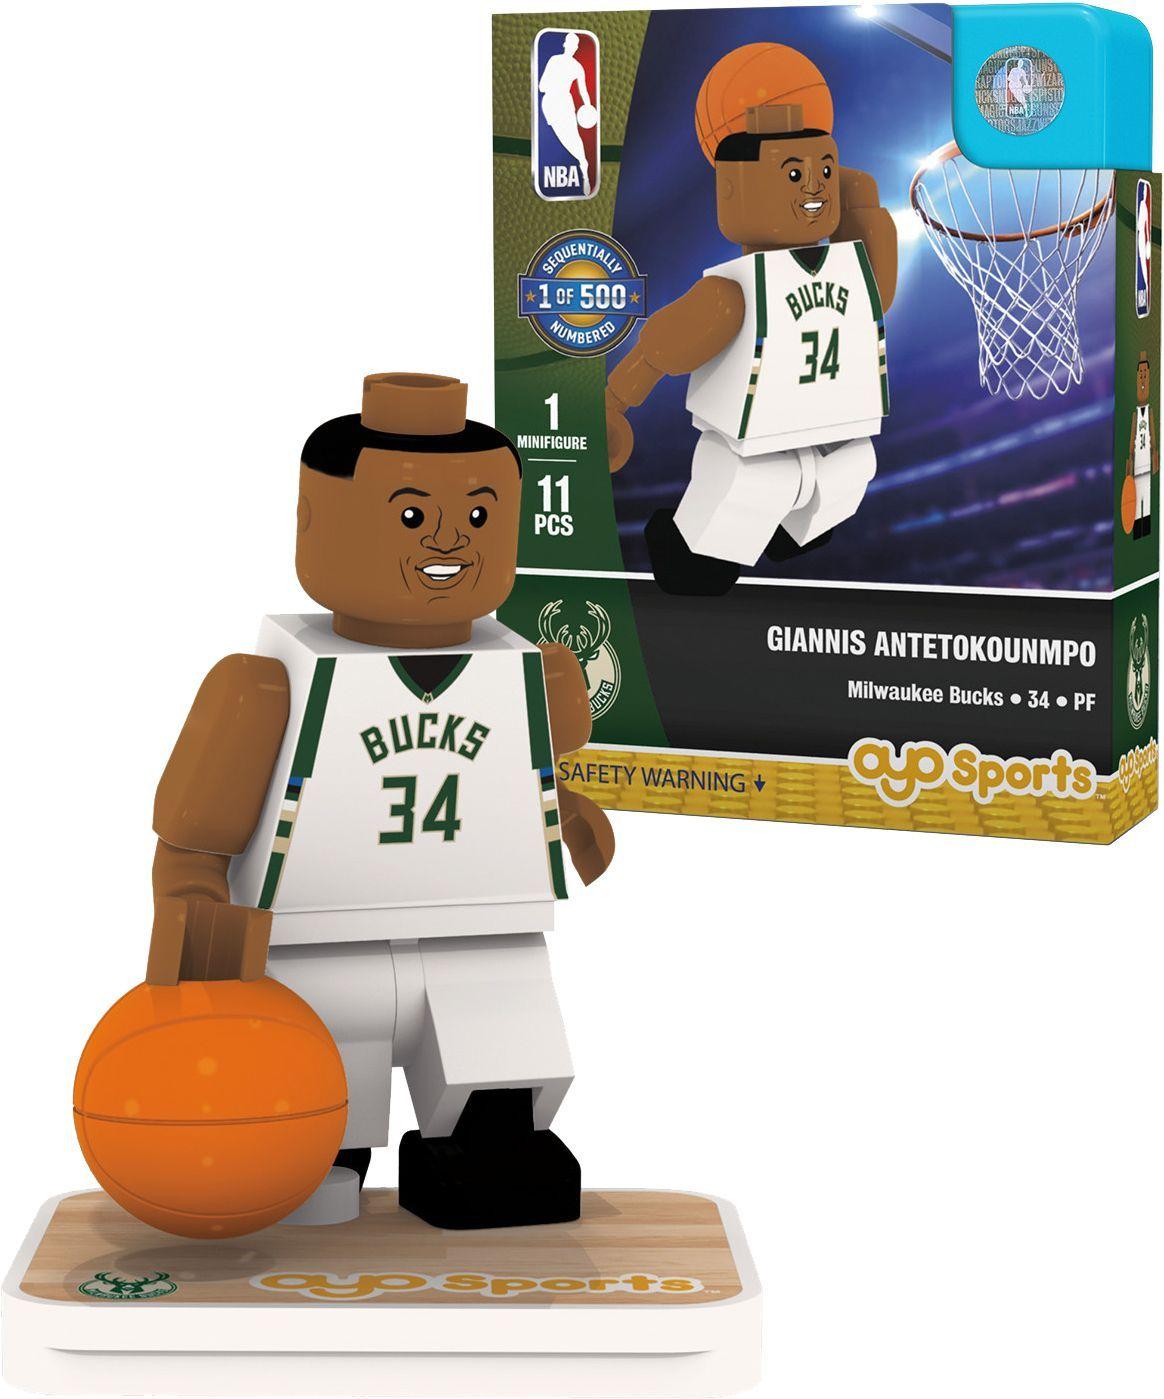 OYO Milwaukee Bucks Giannis Antetokounmpo Figurine, Team